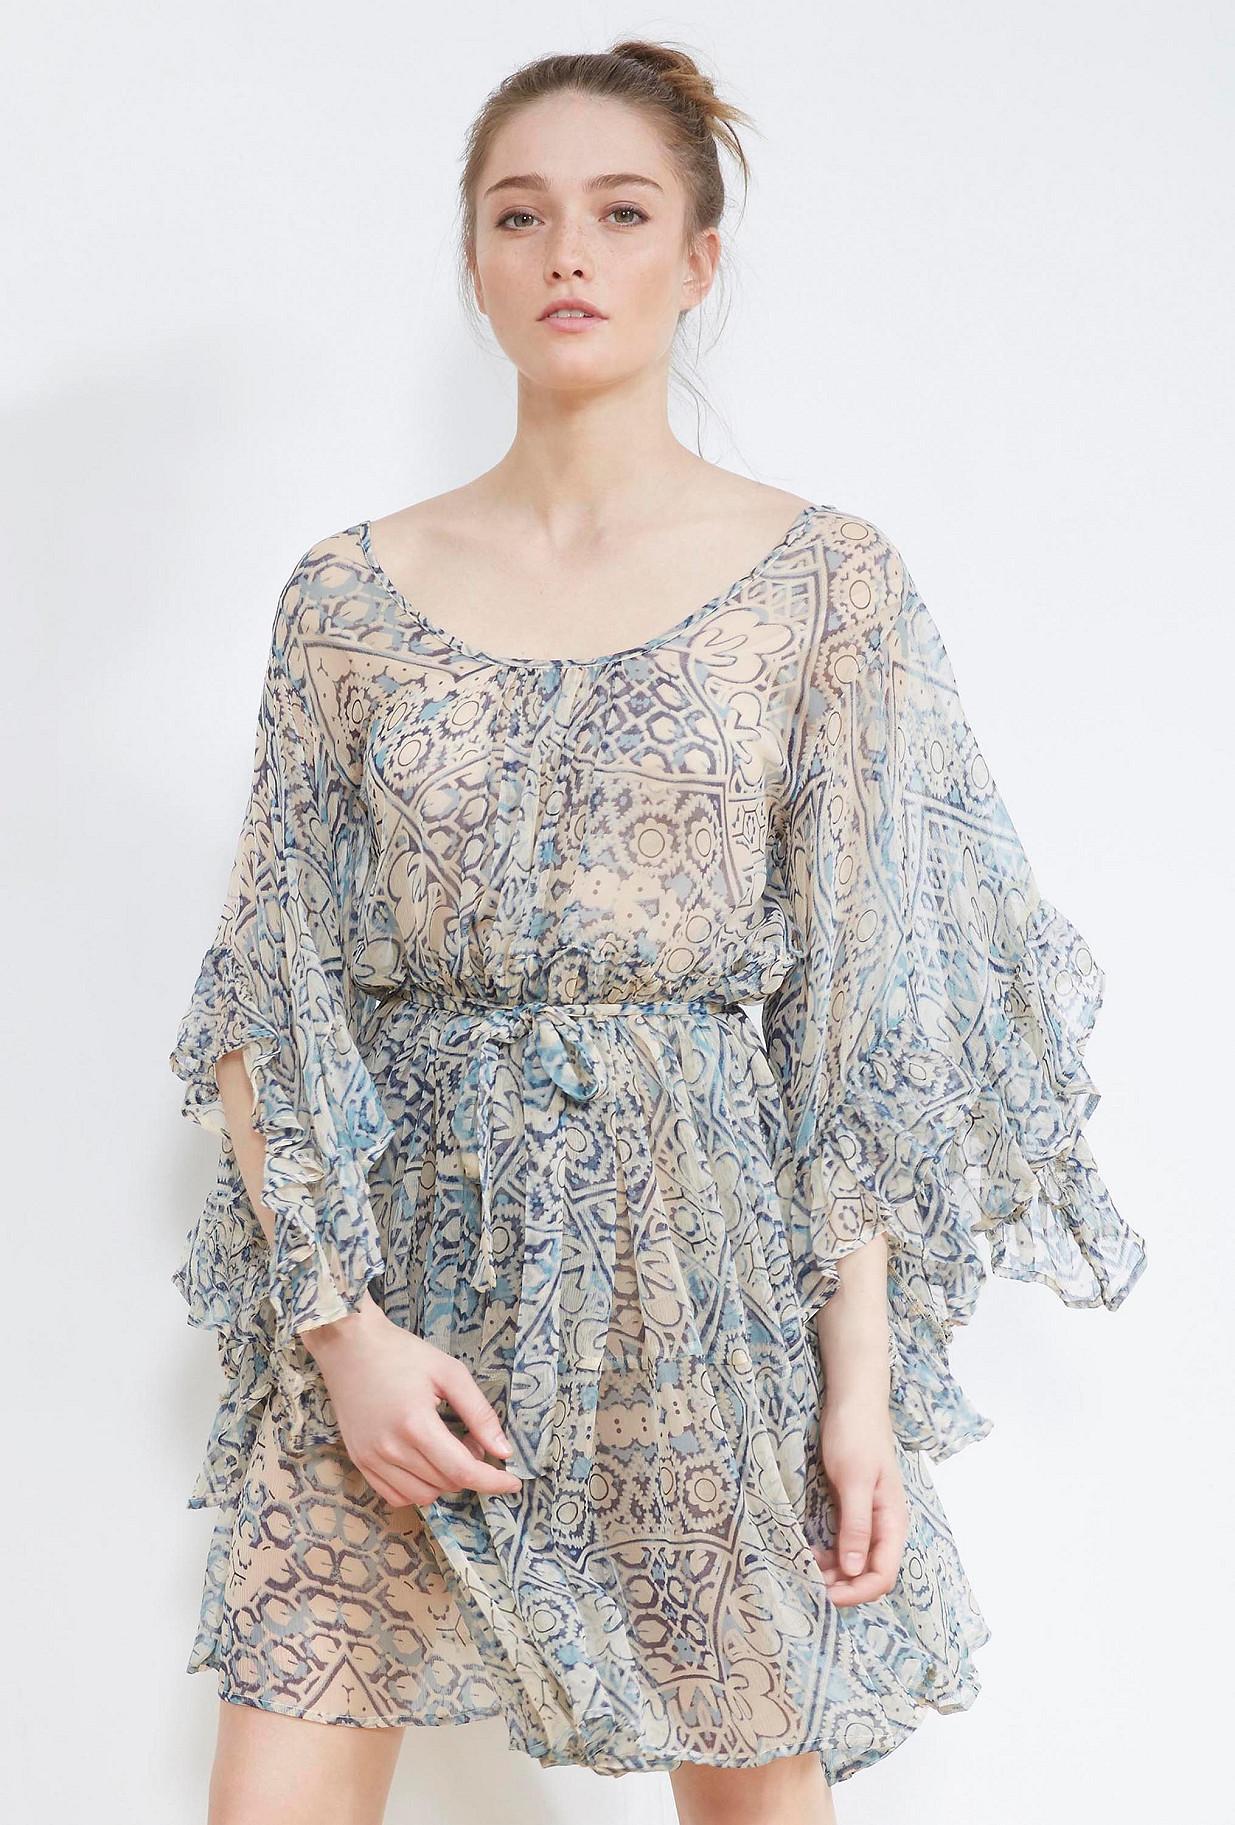 clothes store DRESS  Faenza french designer fashion Paris